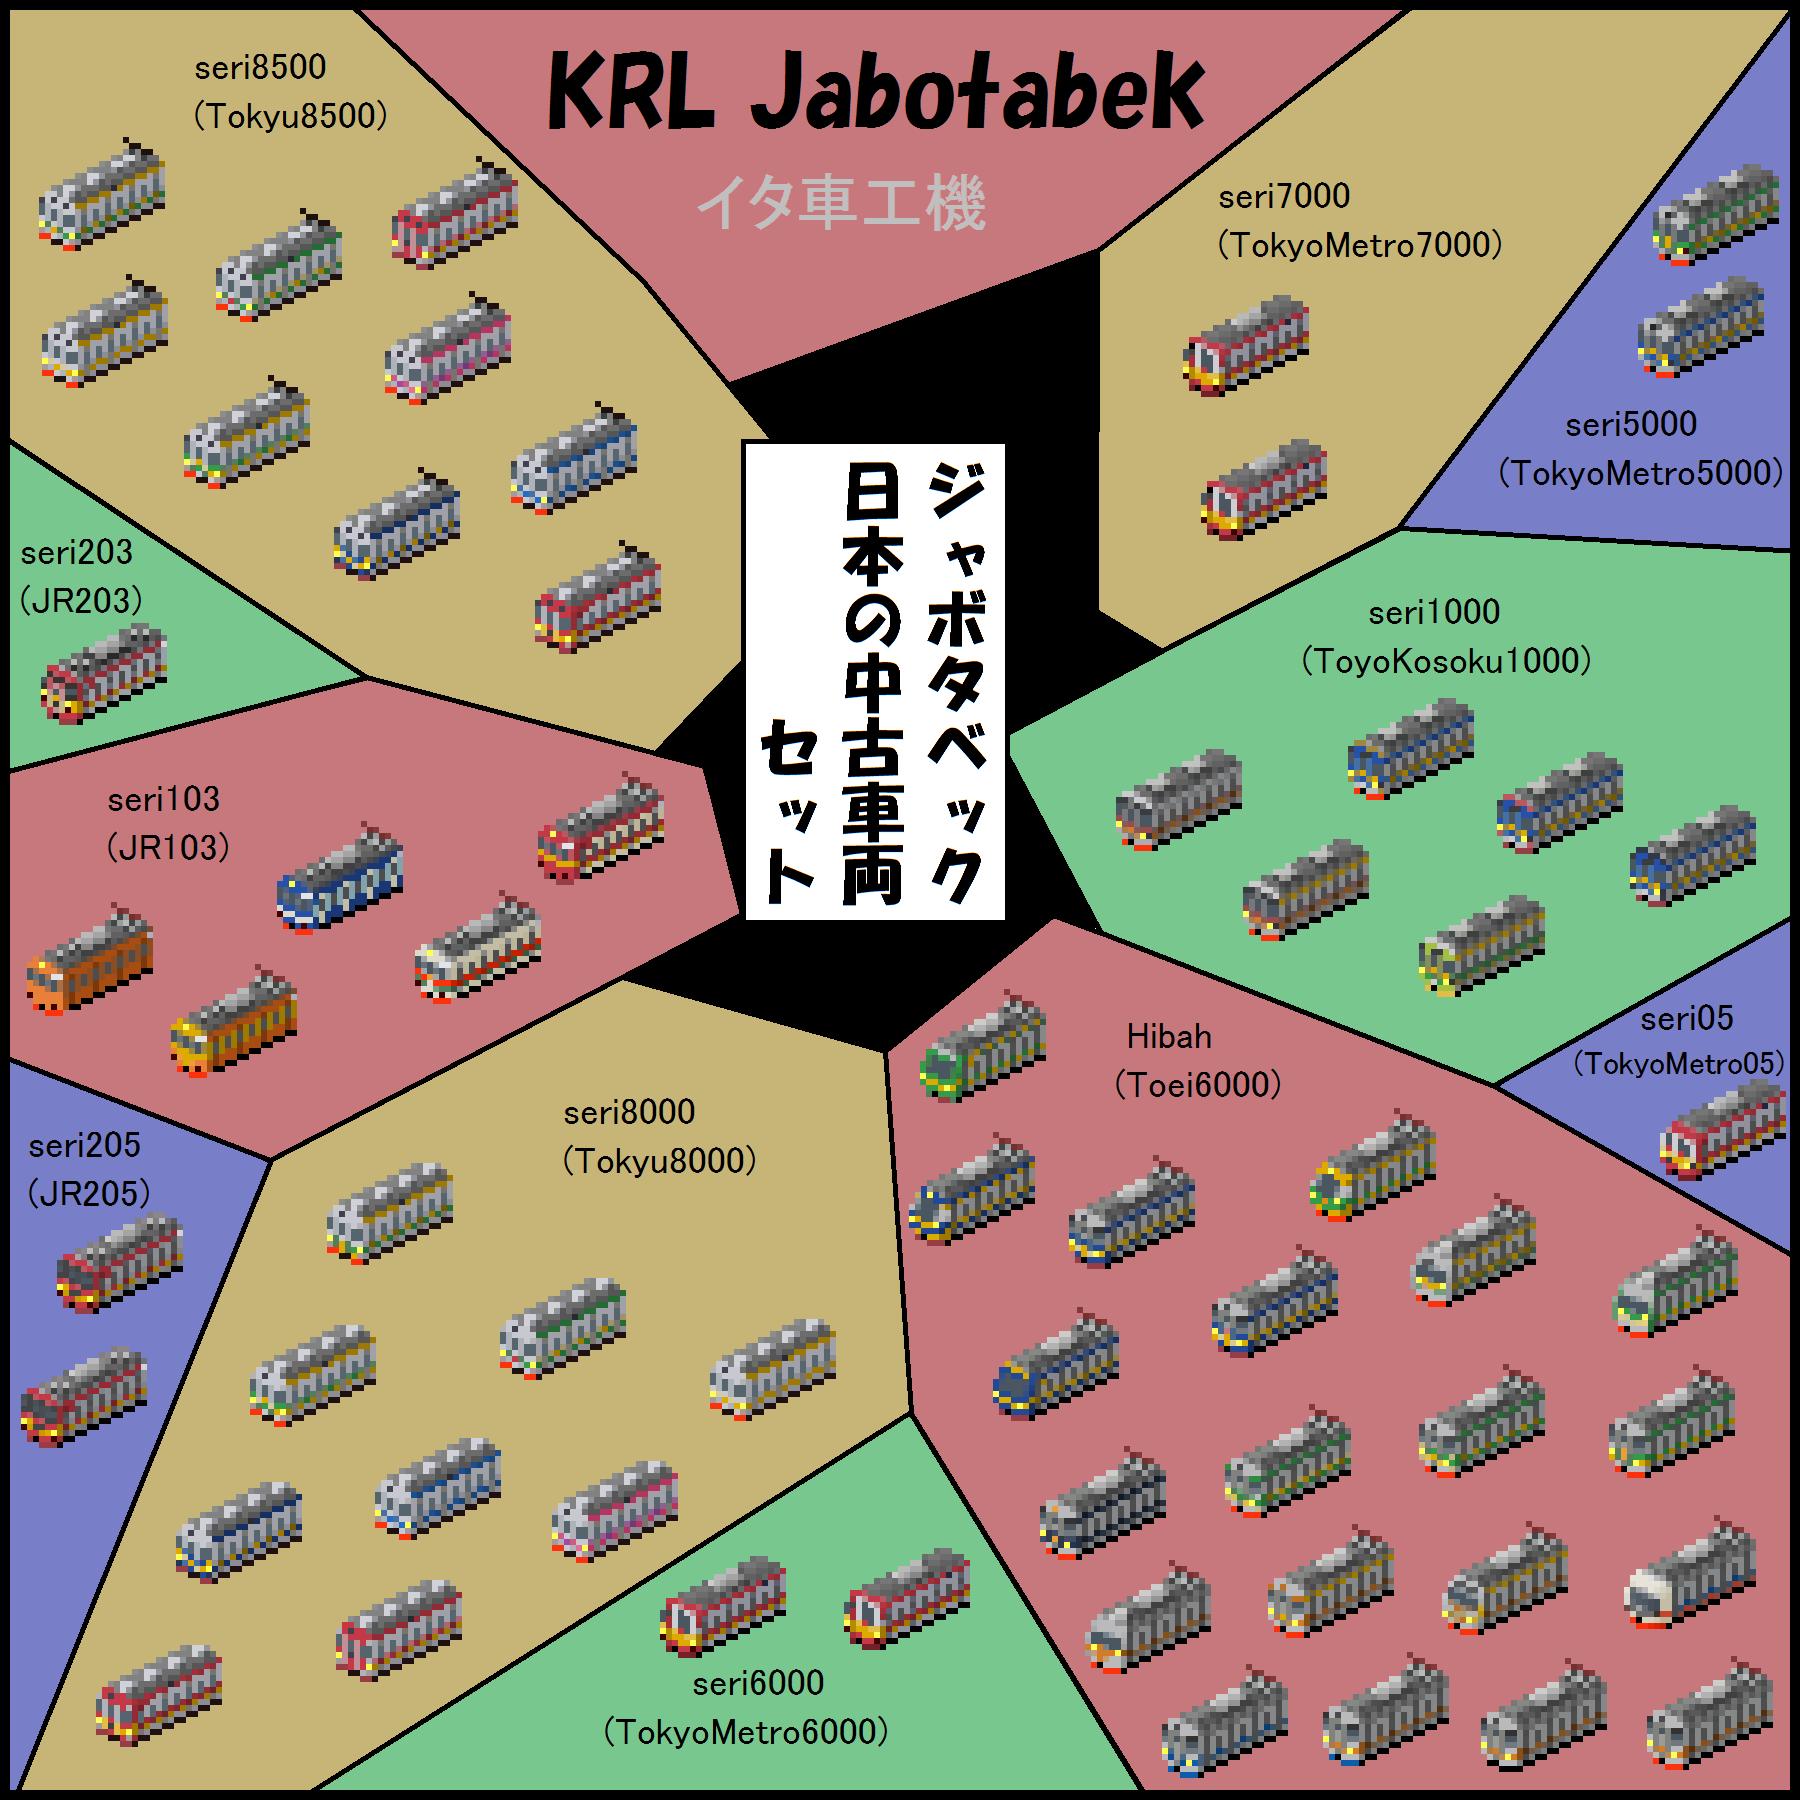 Jabotabekimage.png